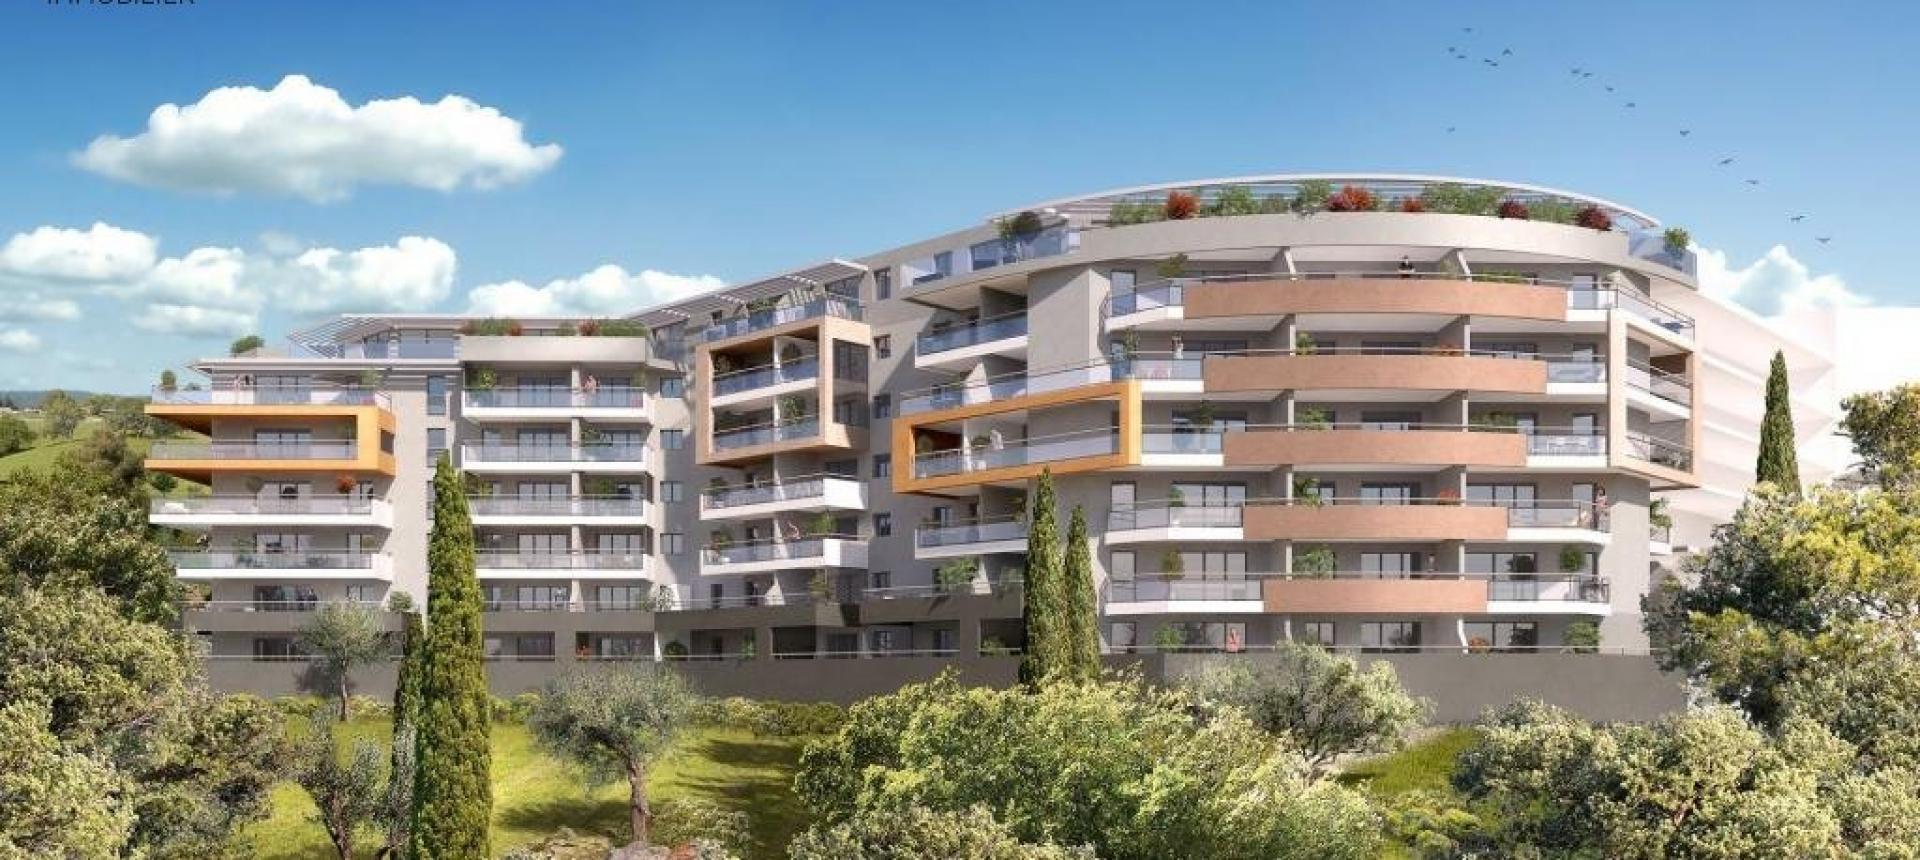 Programme Immobilier Neuf LE GENOVESE en Corse à Ajaccio